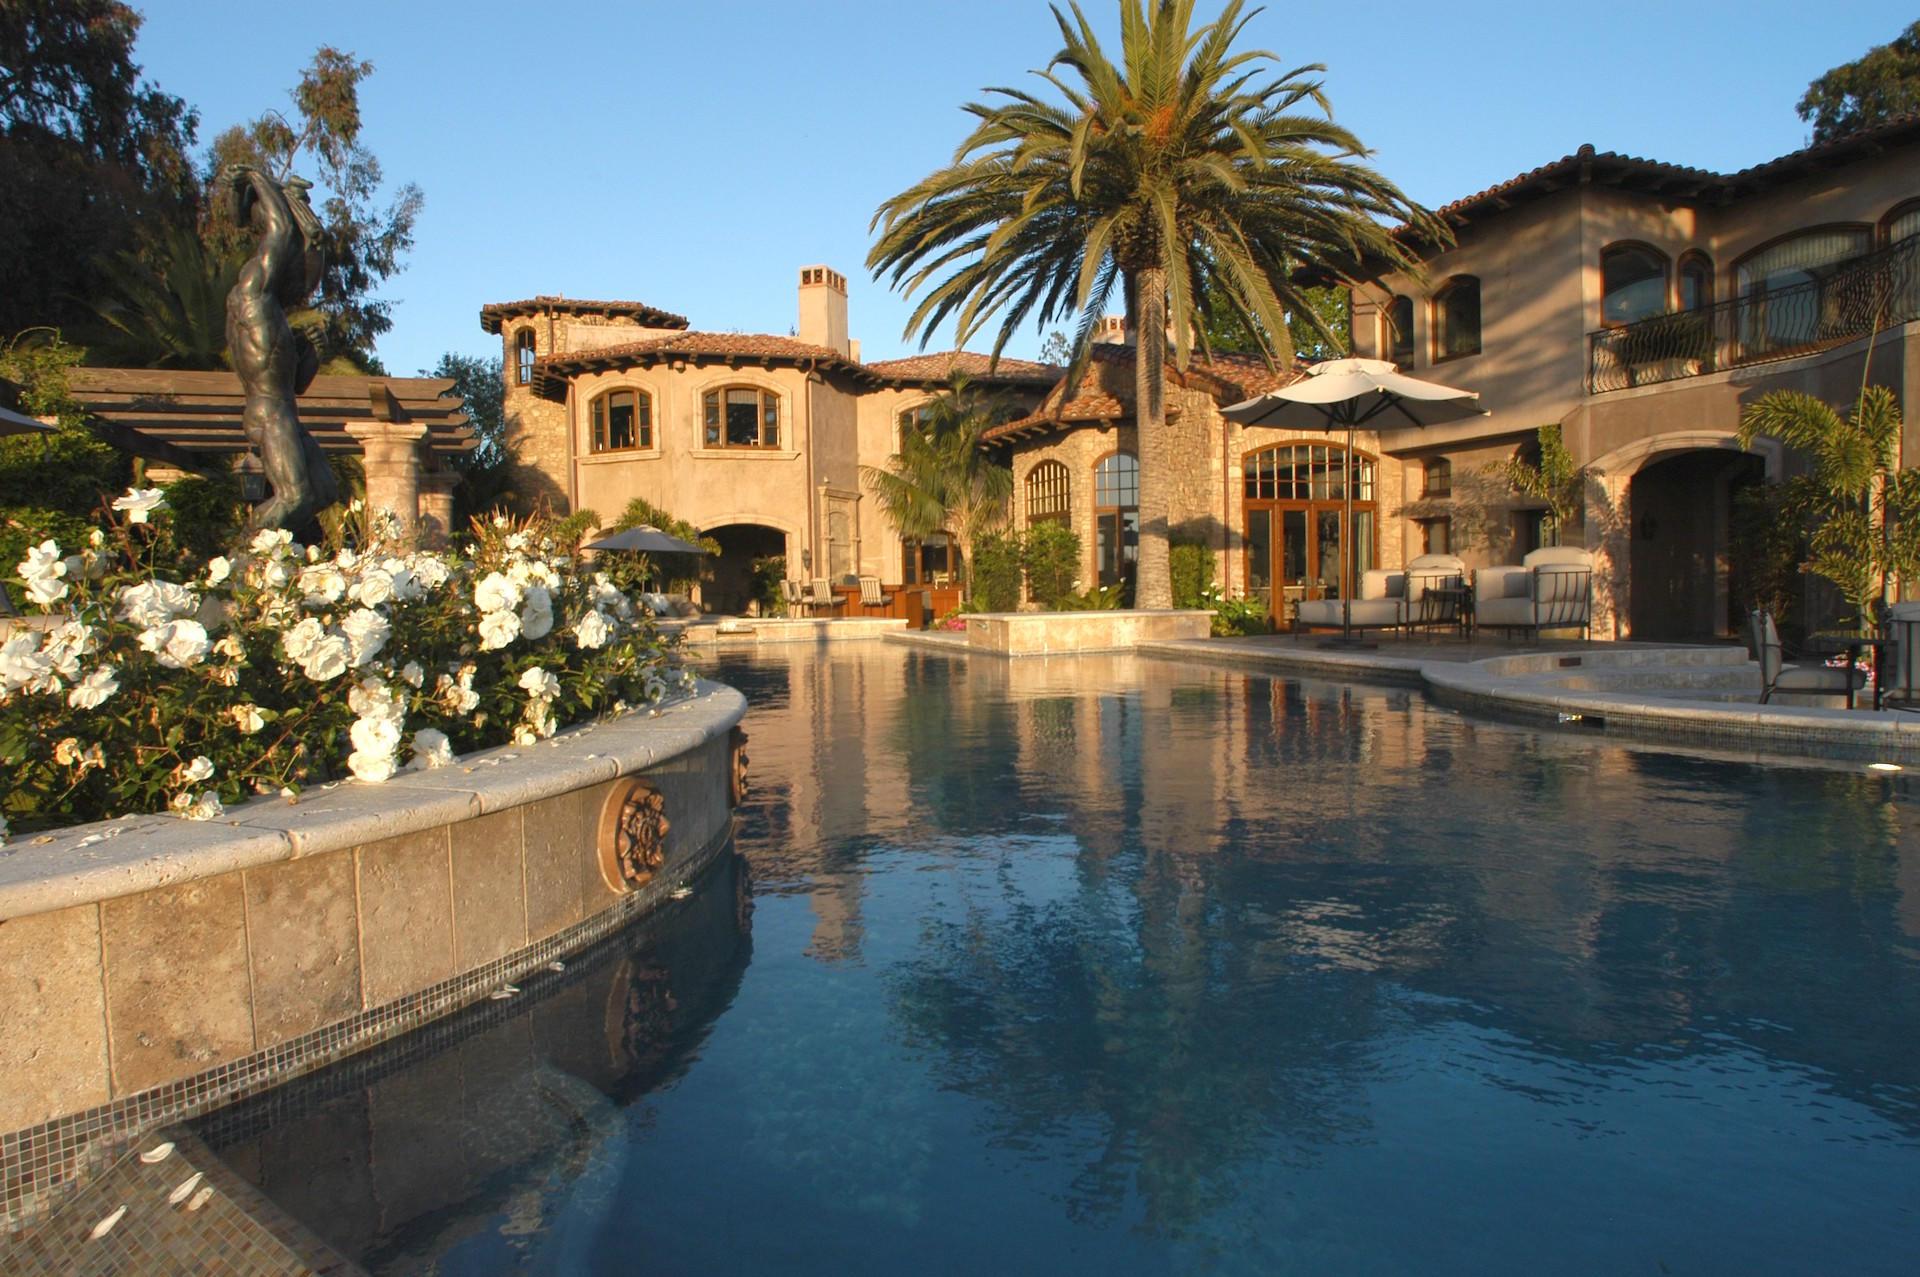 San Diego Home Appraisals image 0